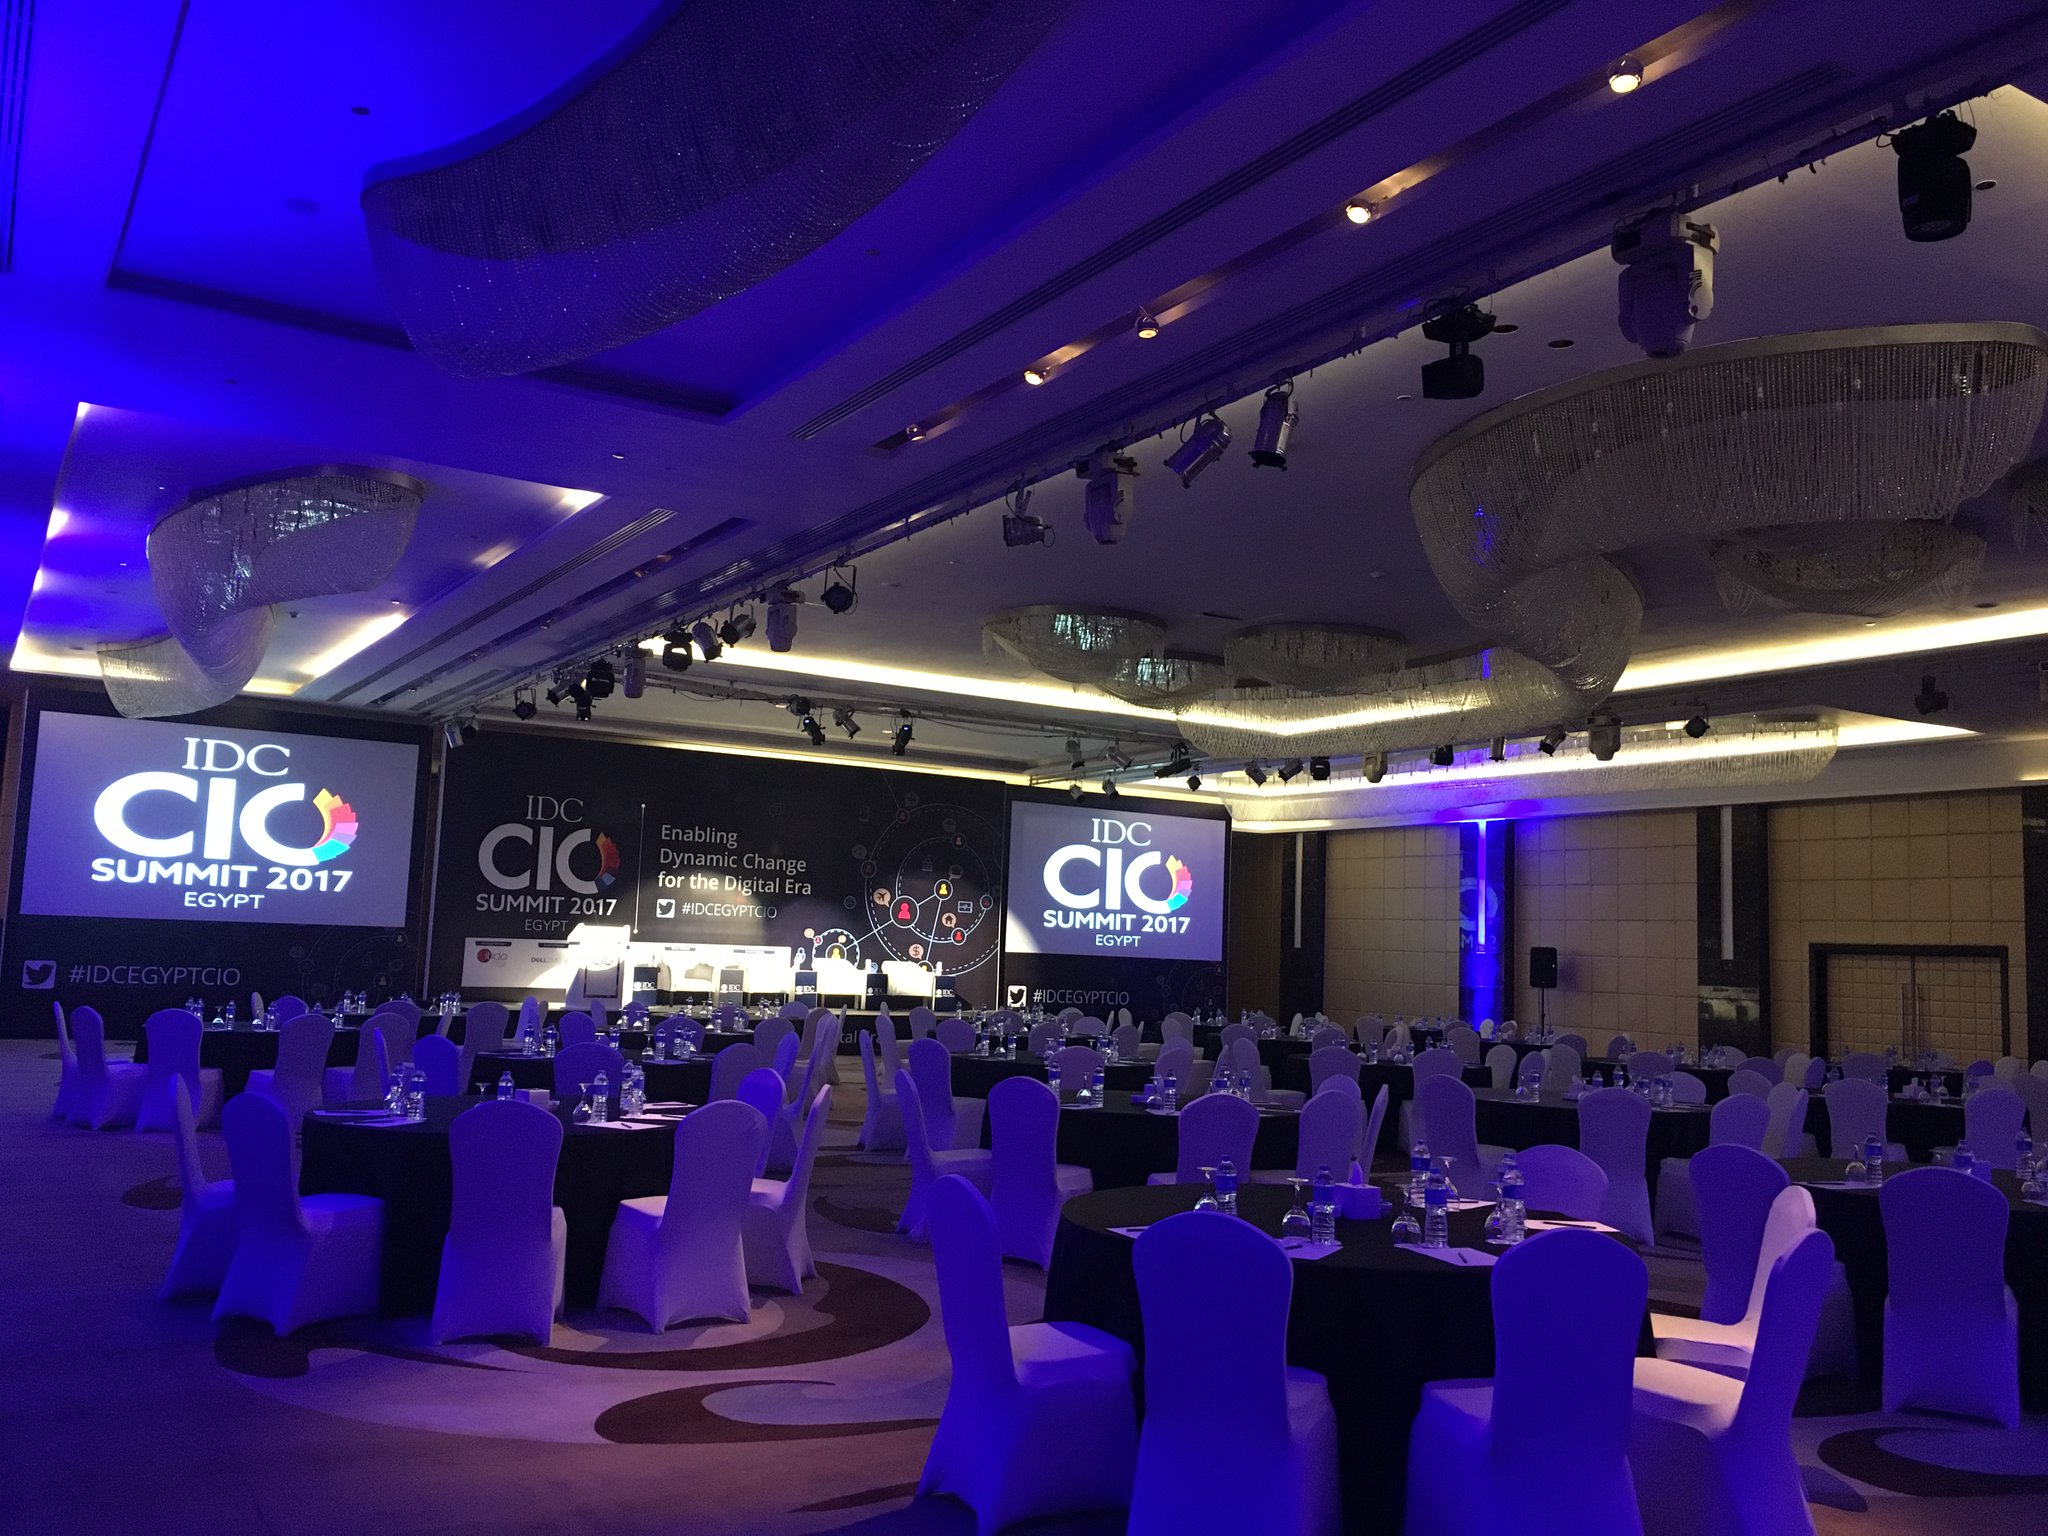 IDC CIO Summit 2017 Cairo